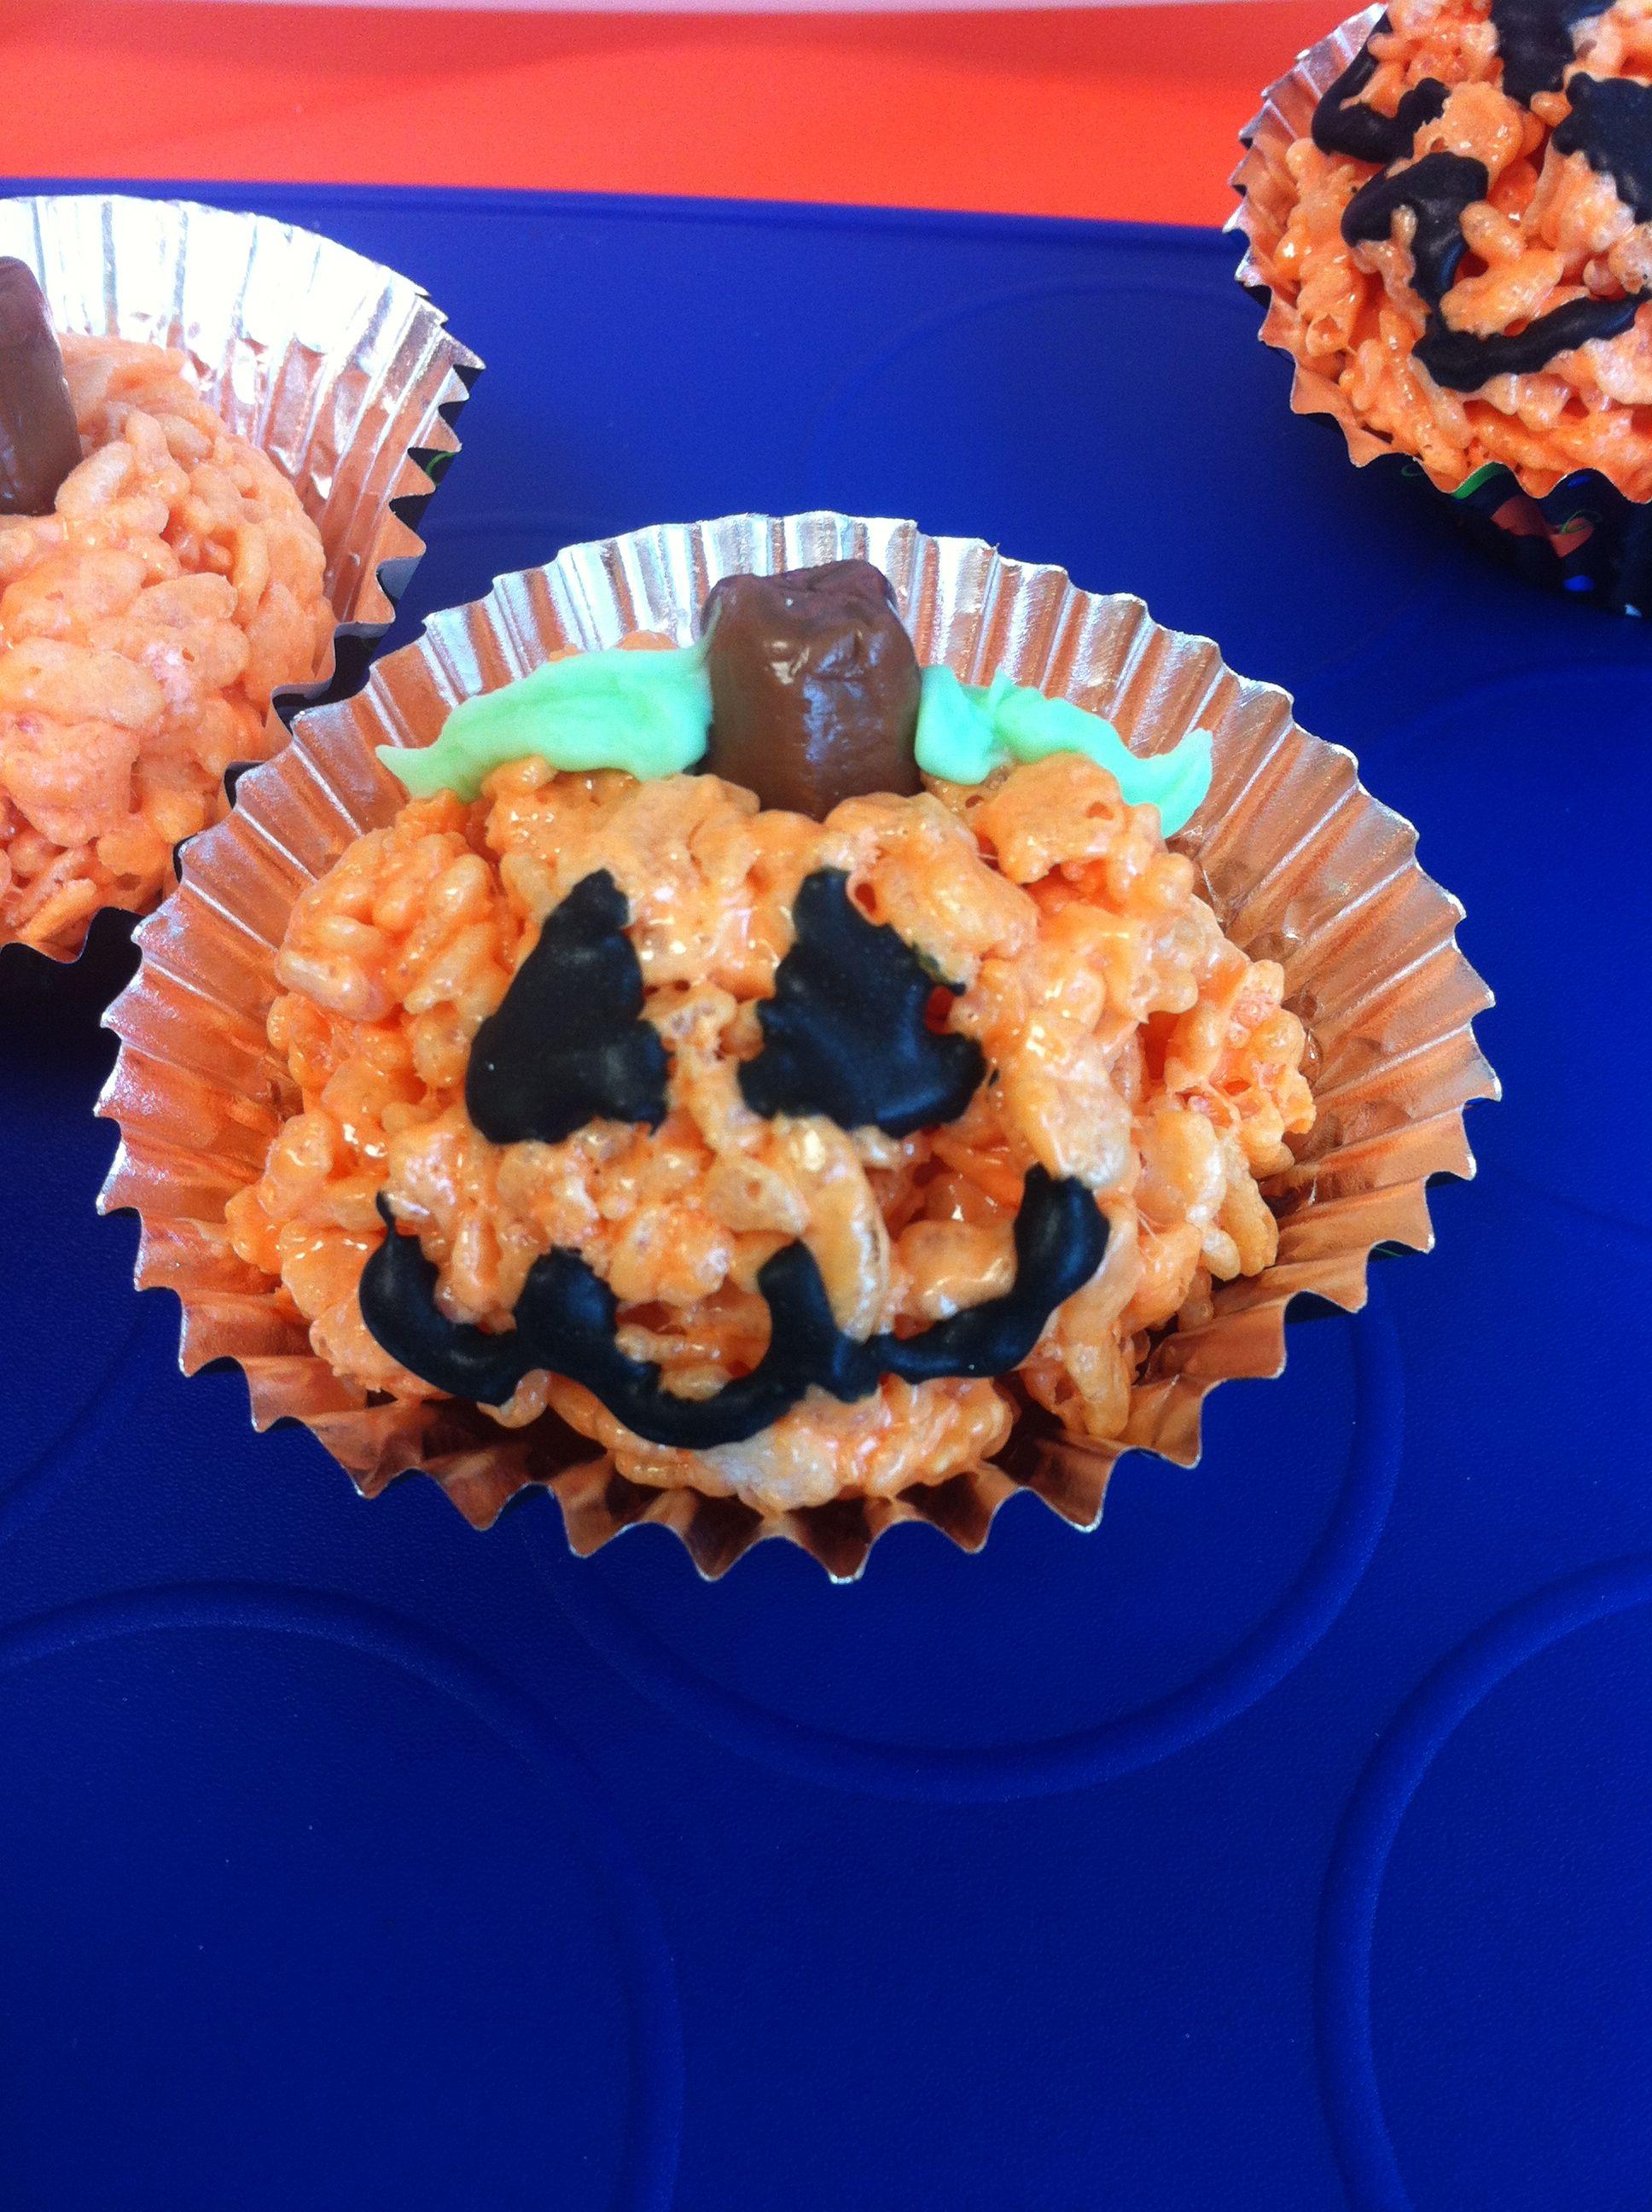 My attempt at Krispy Jack-o-lanterns!